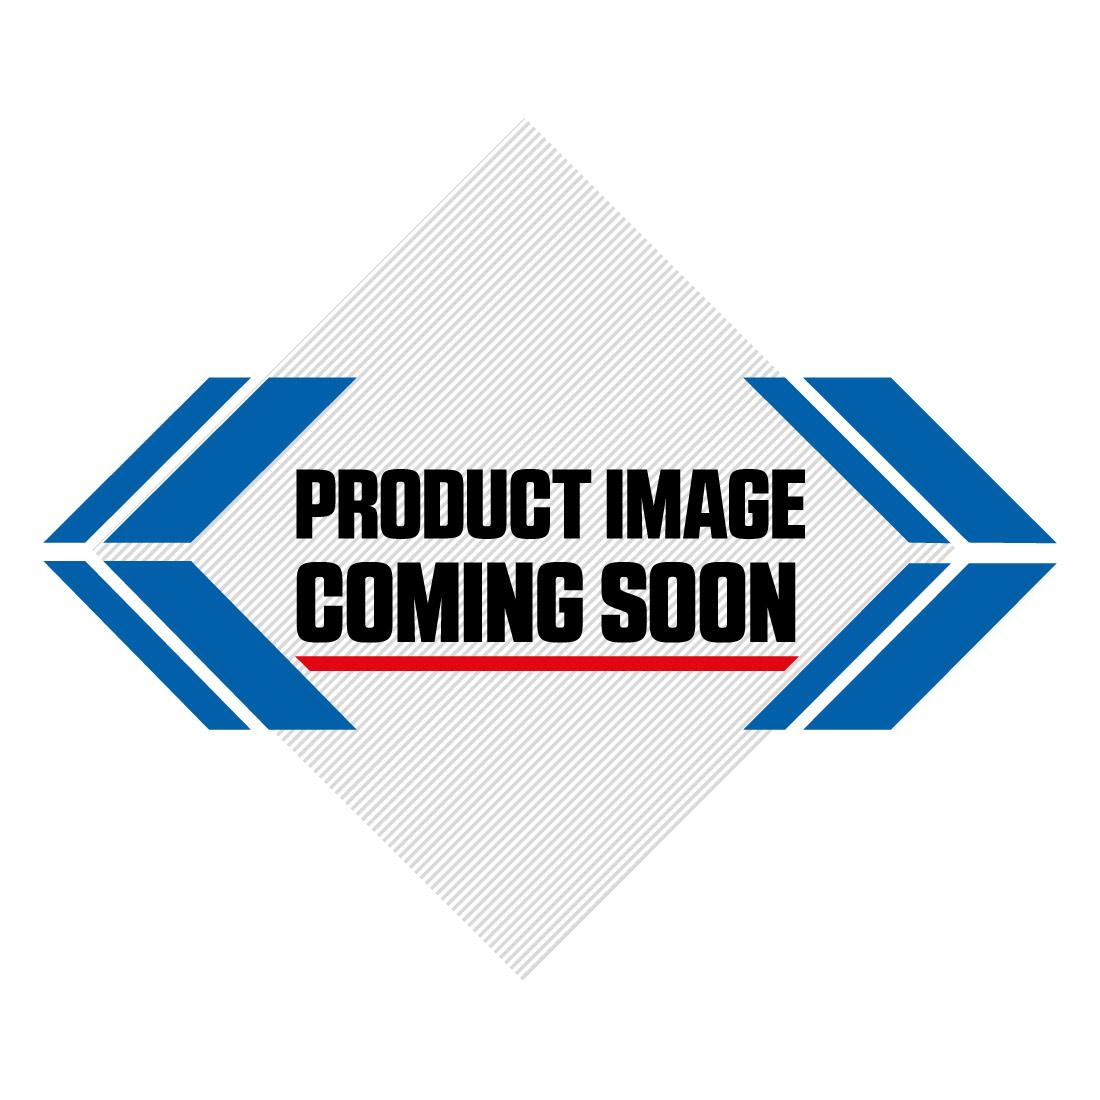 Suzuki Plastic Kit Suzuki RMZ 450 (08-17) White Image-1